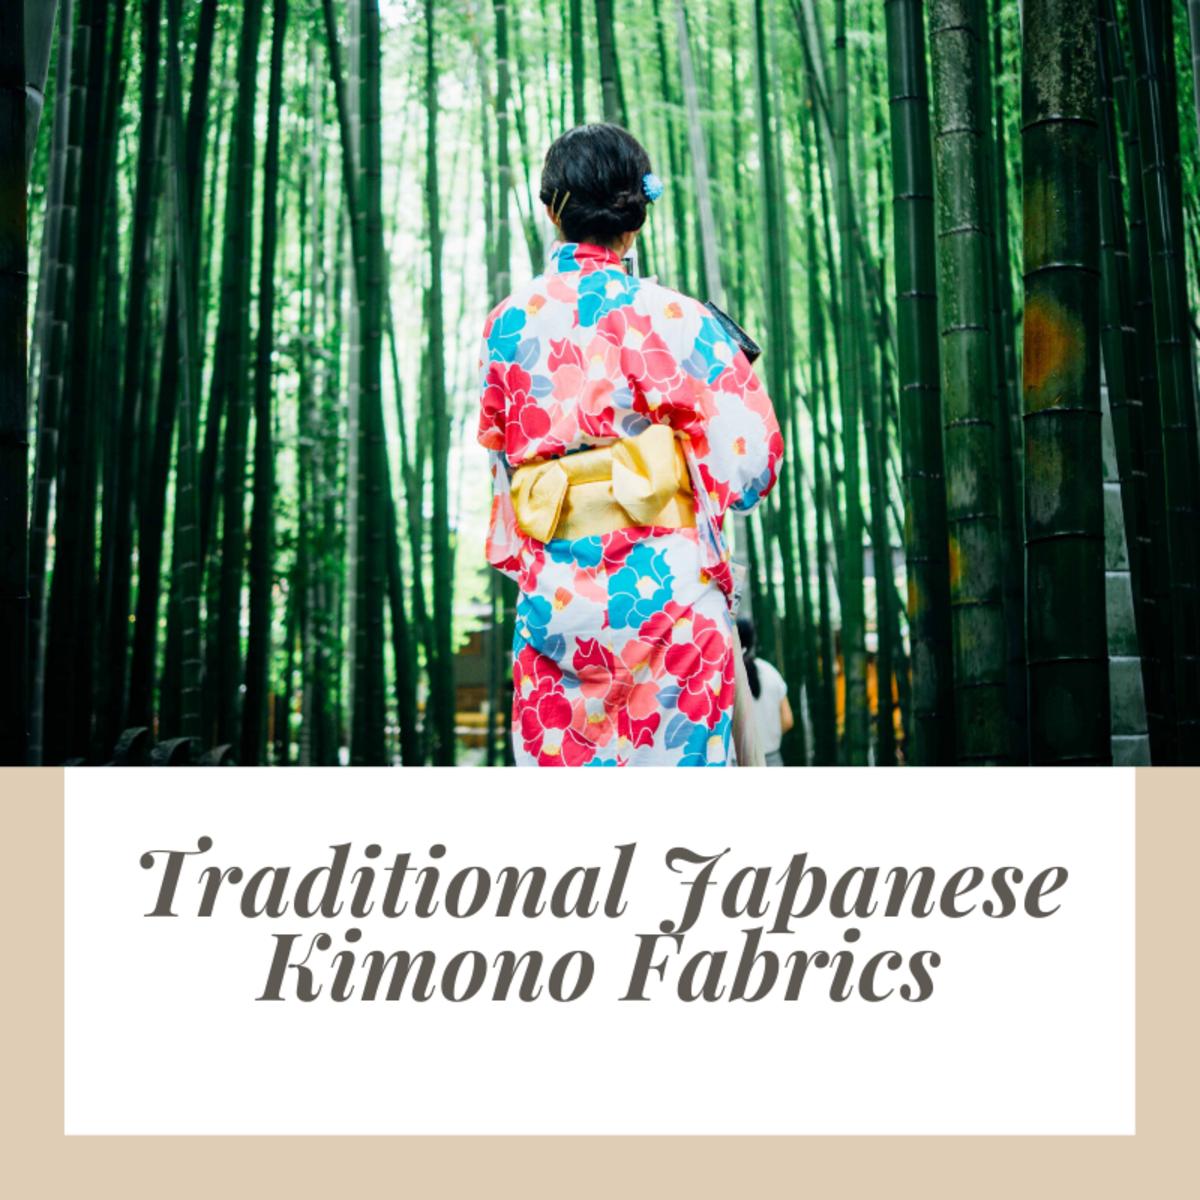 Traditional Japanese Kimono Fabrics